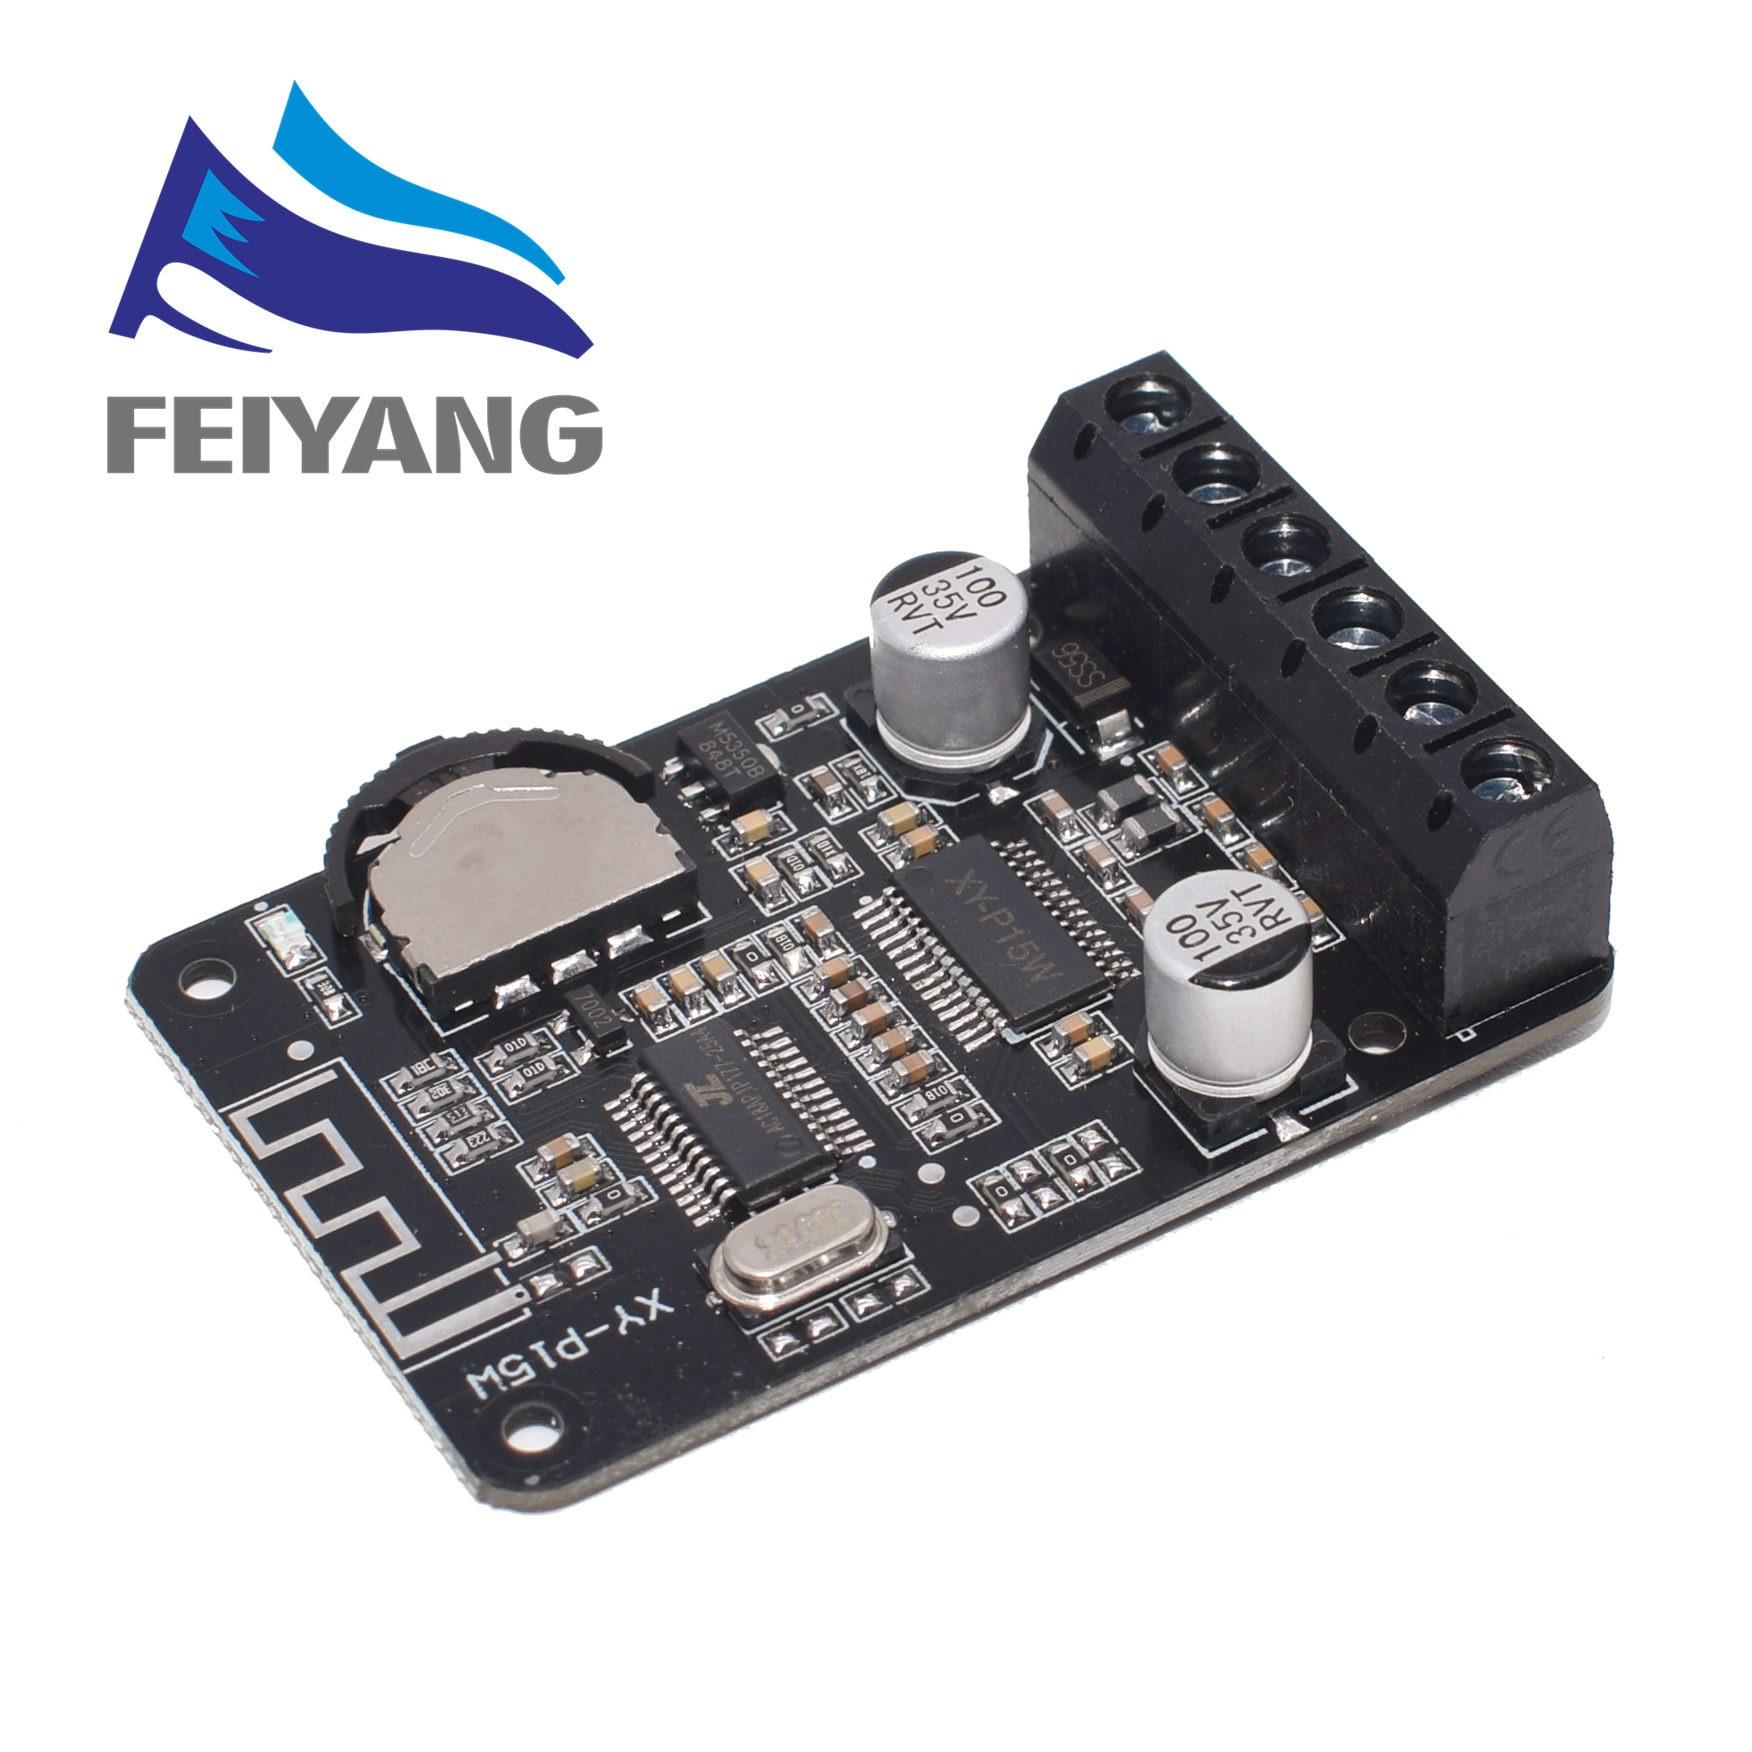 10W/15W/20W Placa De Amplificador de Potência Estéreo Bluetooth 12V/24V de Alta Potência módulo Amplificador Digital XY-P15W